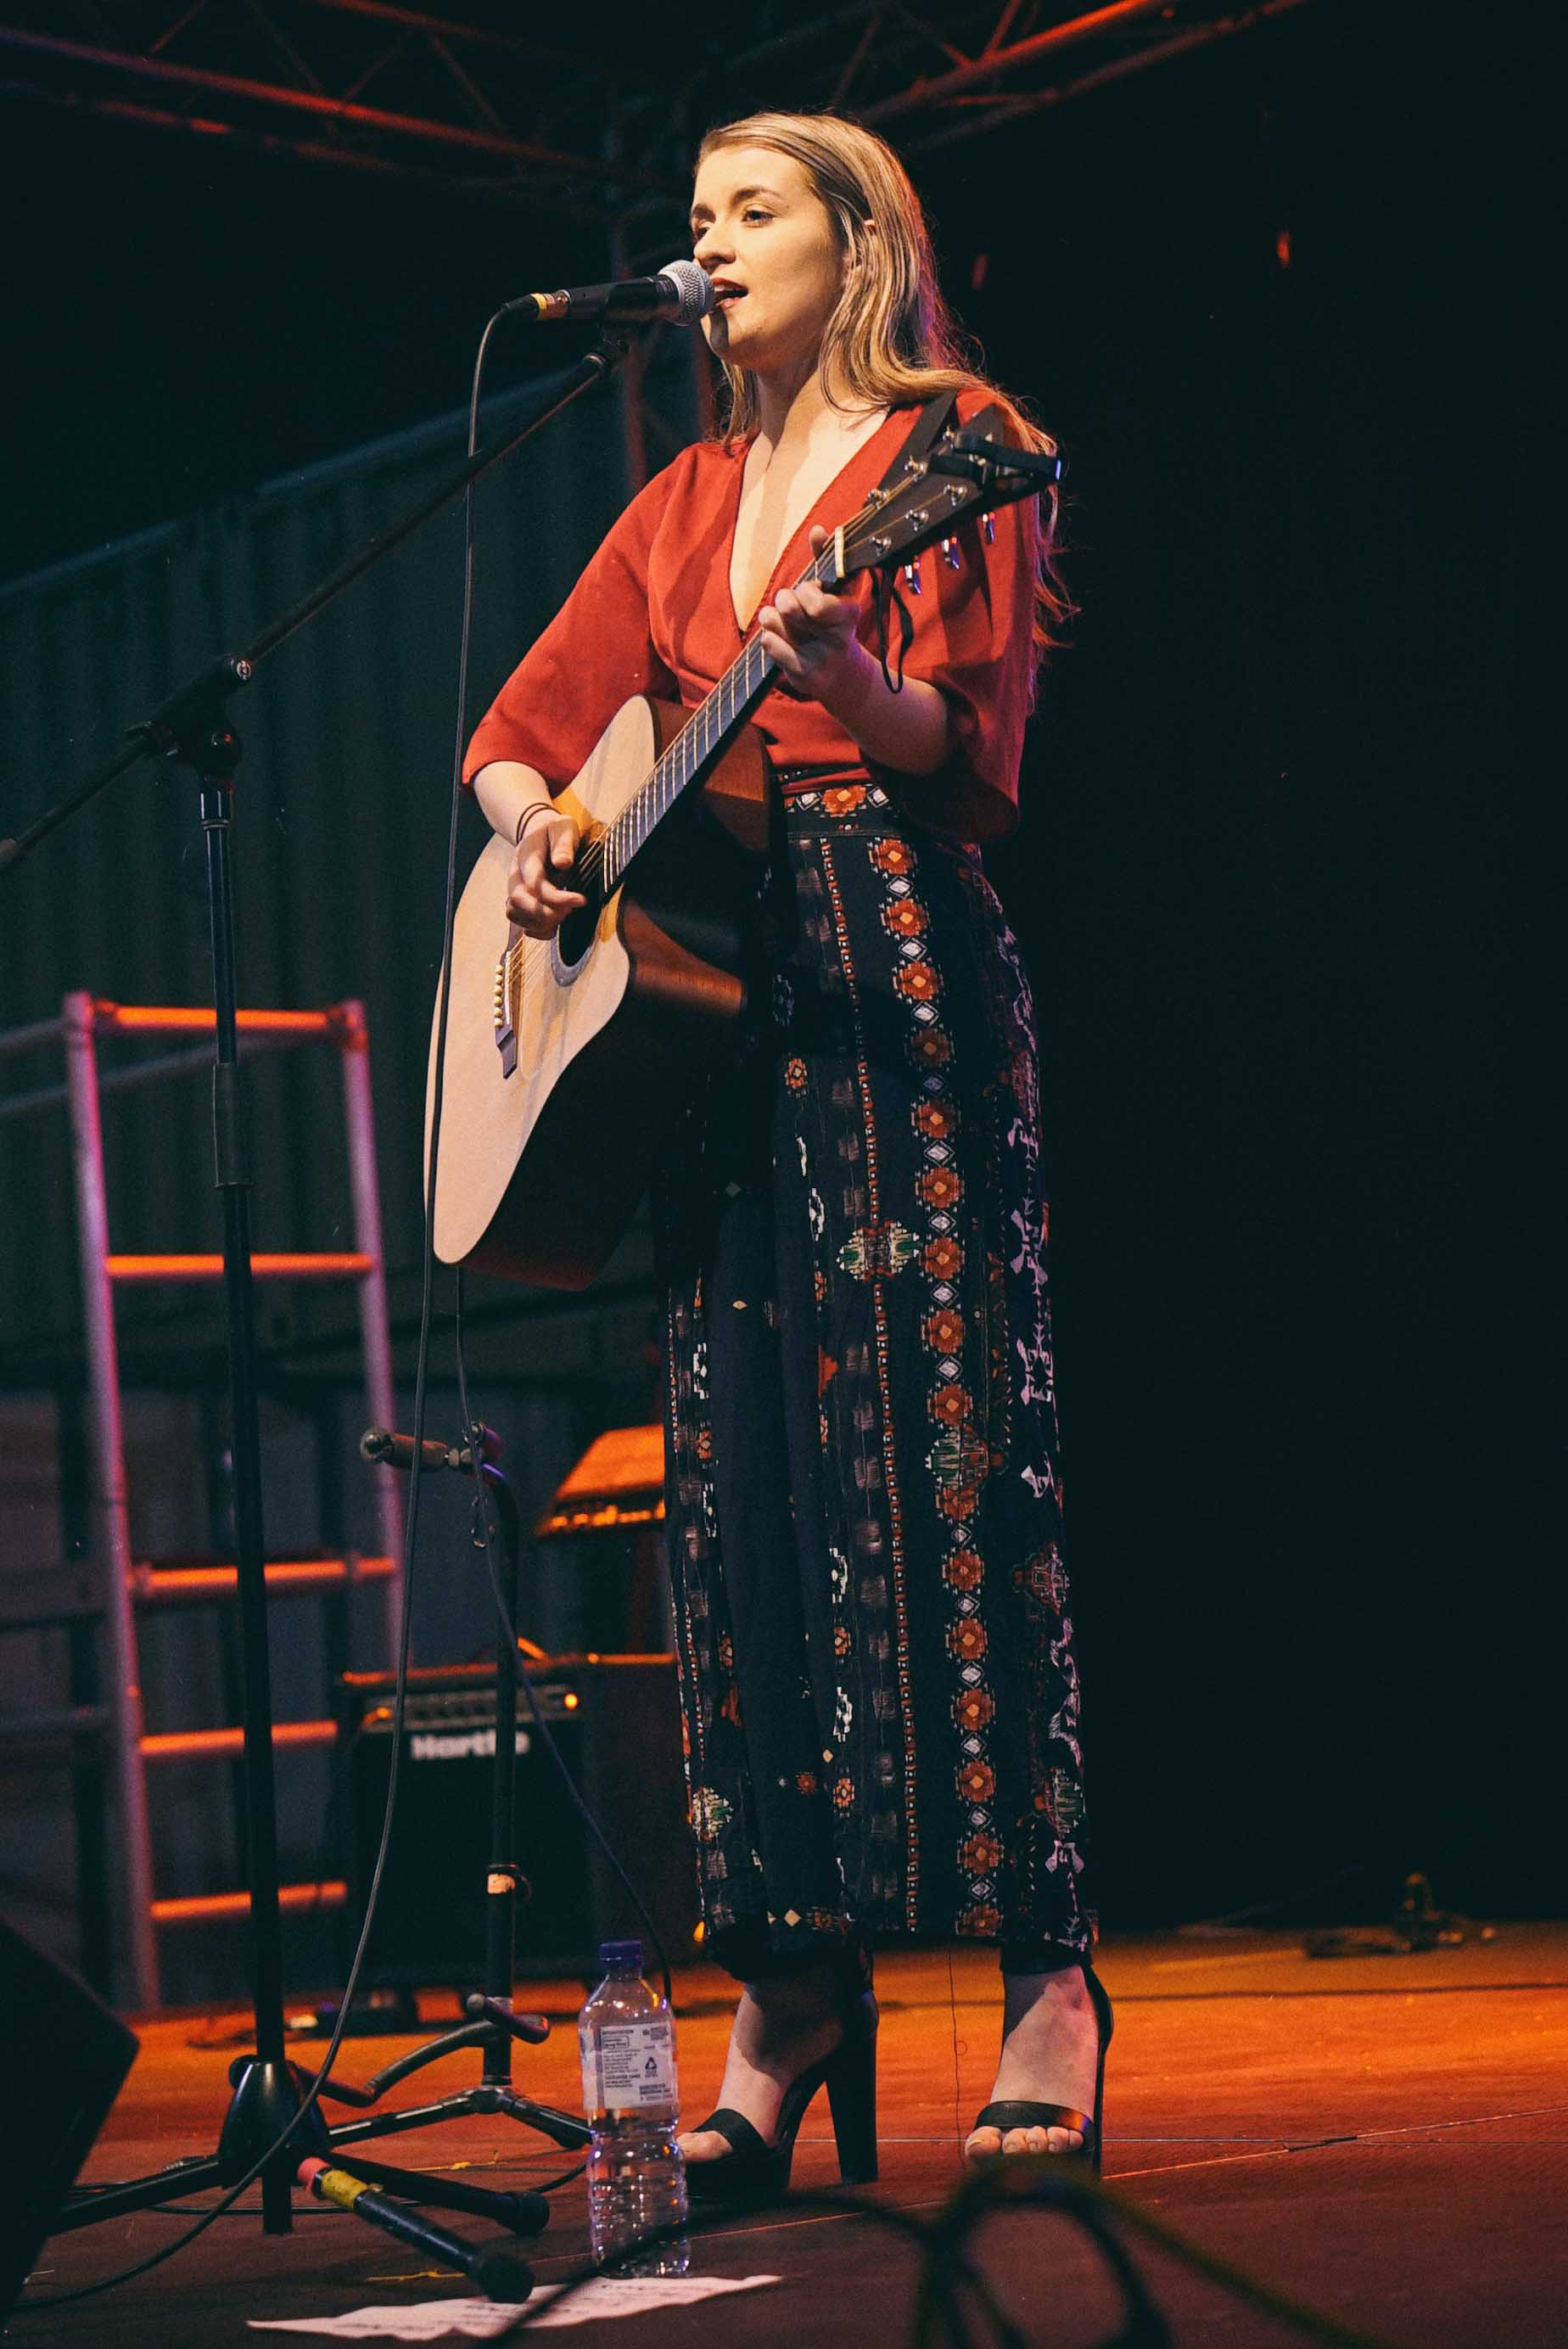 Emily Jane performing at NightQuarter 2018